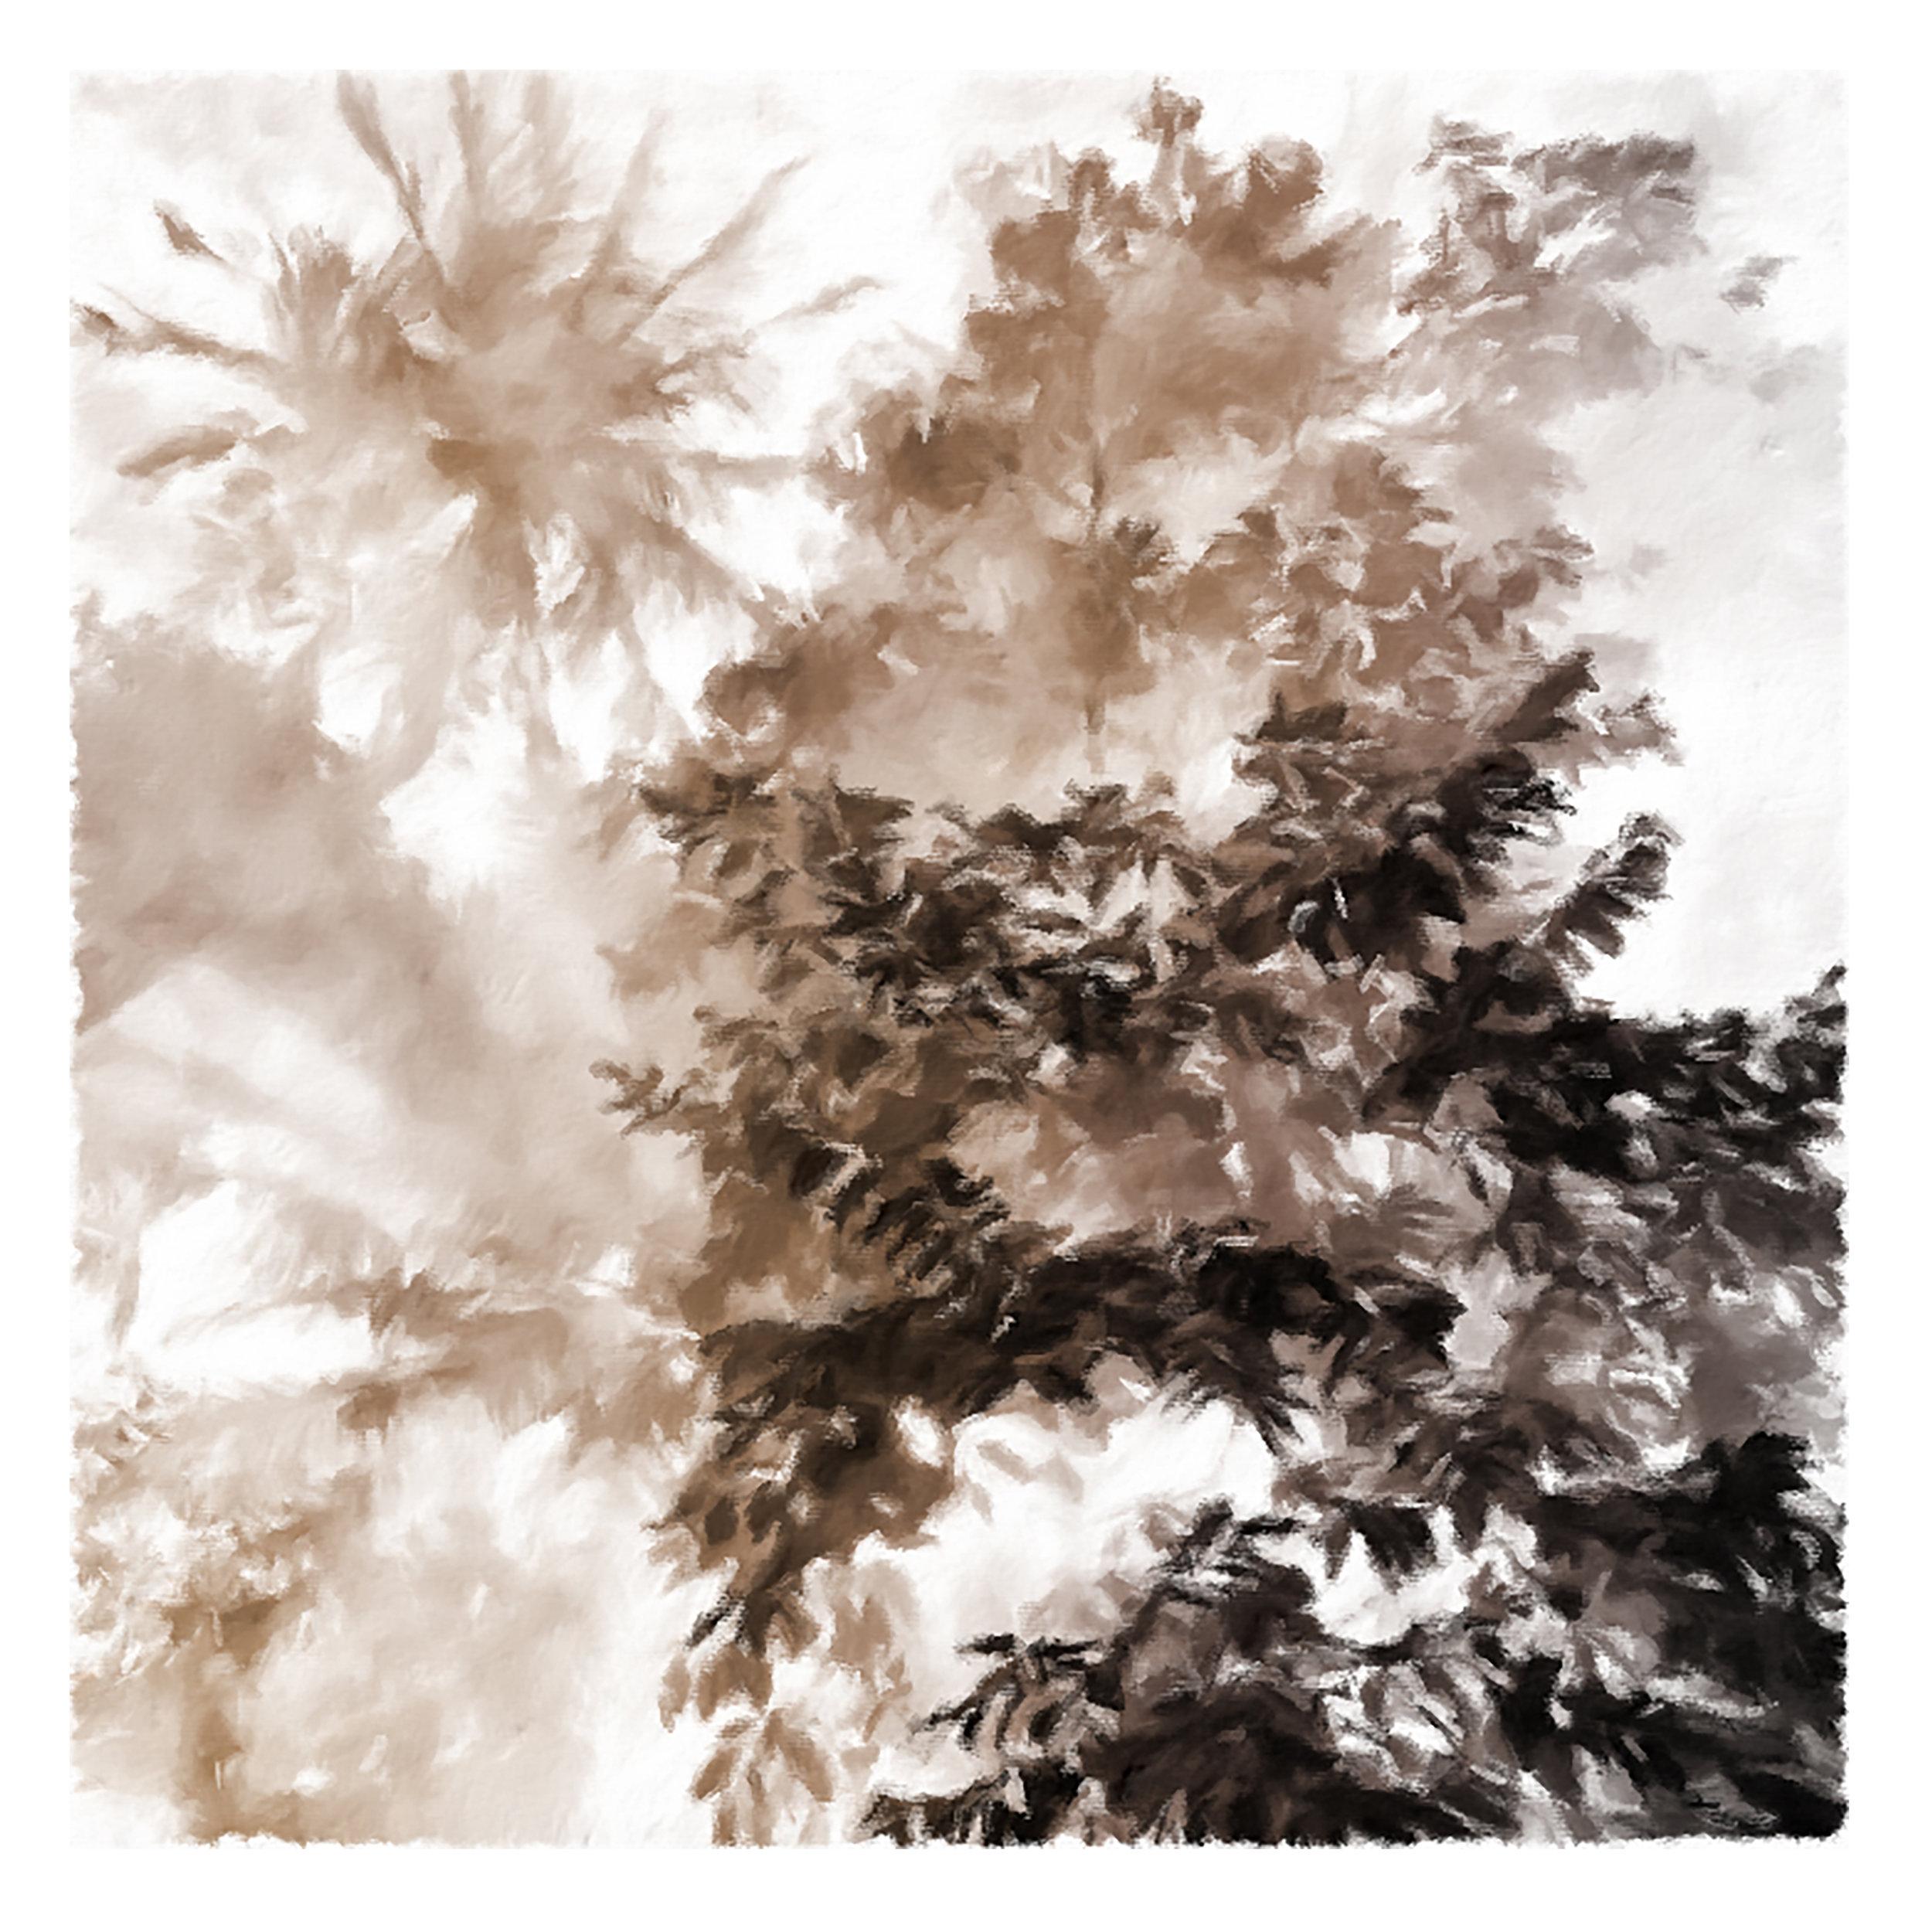 DOUBLES 18x18 mixed media by Susan Kirchman